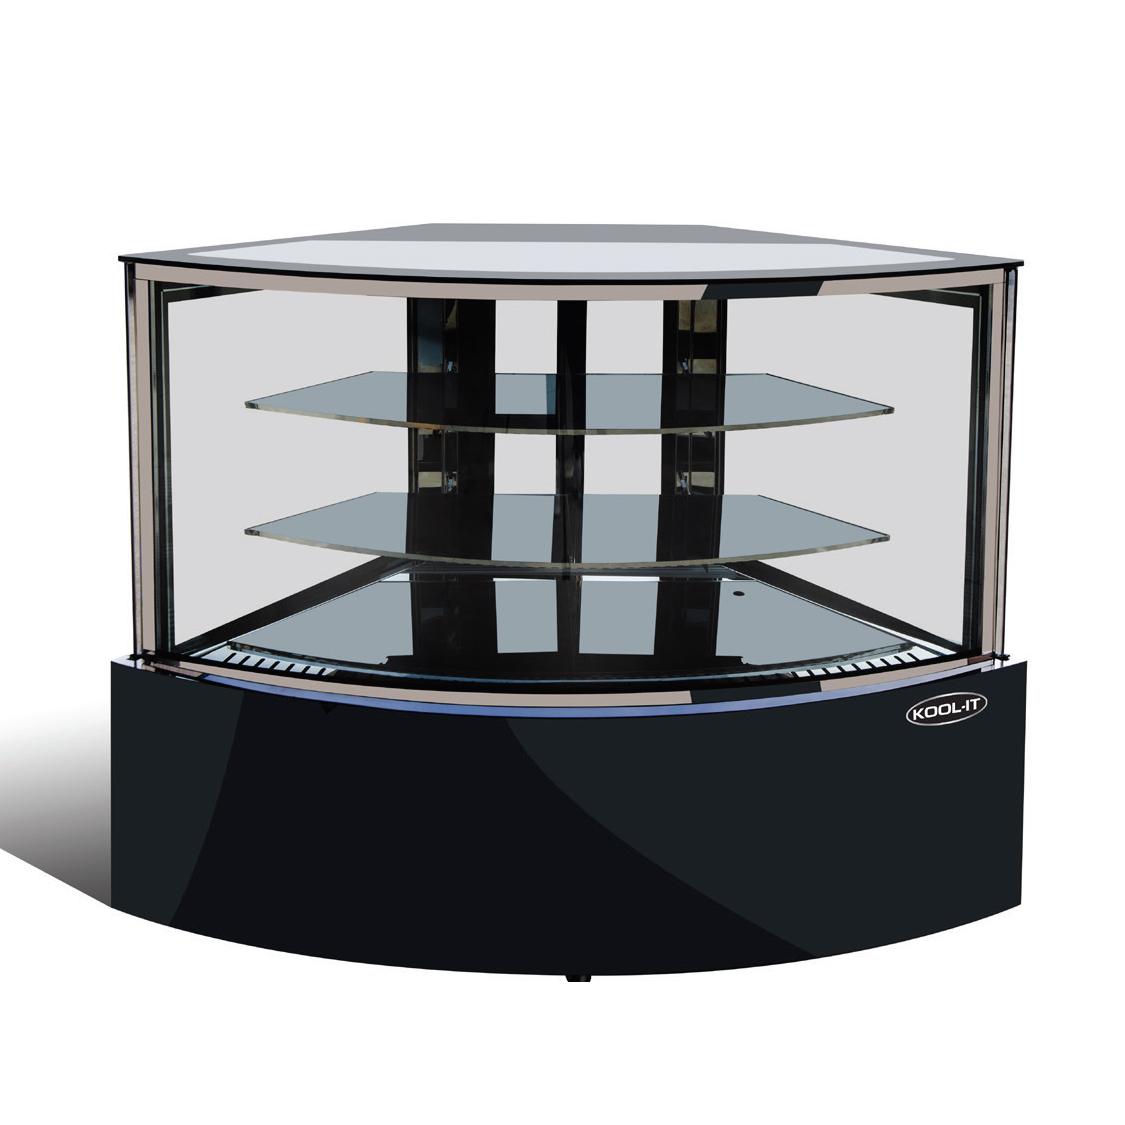 MVP KBF-60C display case, refrigerated